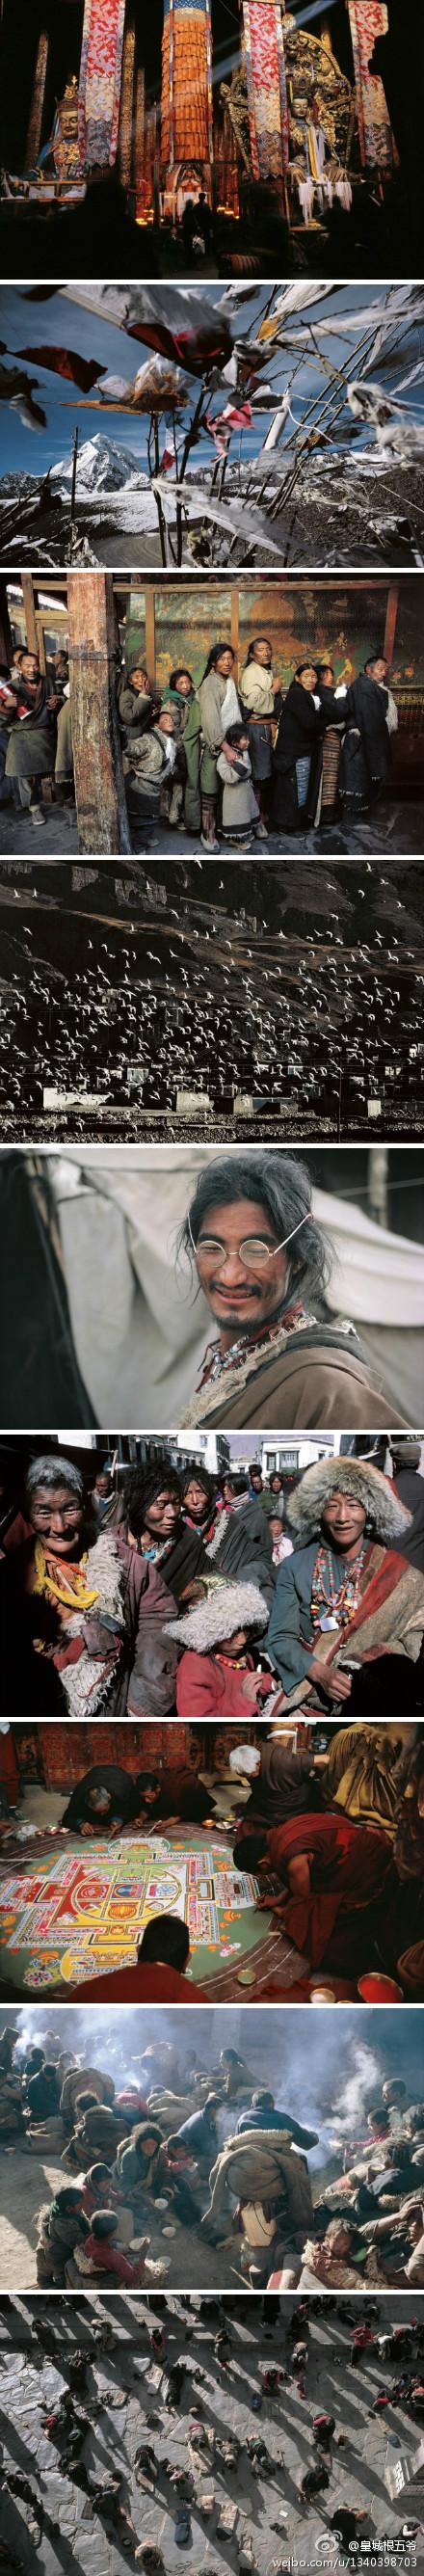 【Tibet·1985 】Marc Ribaud